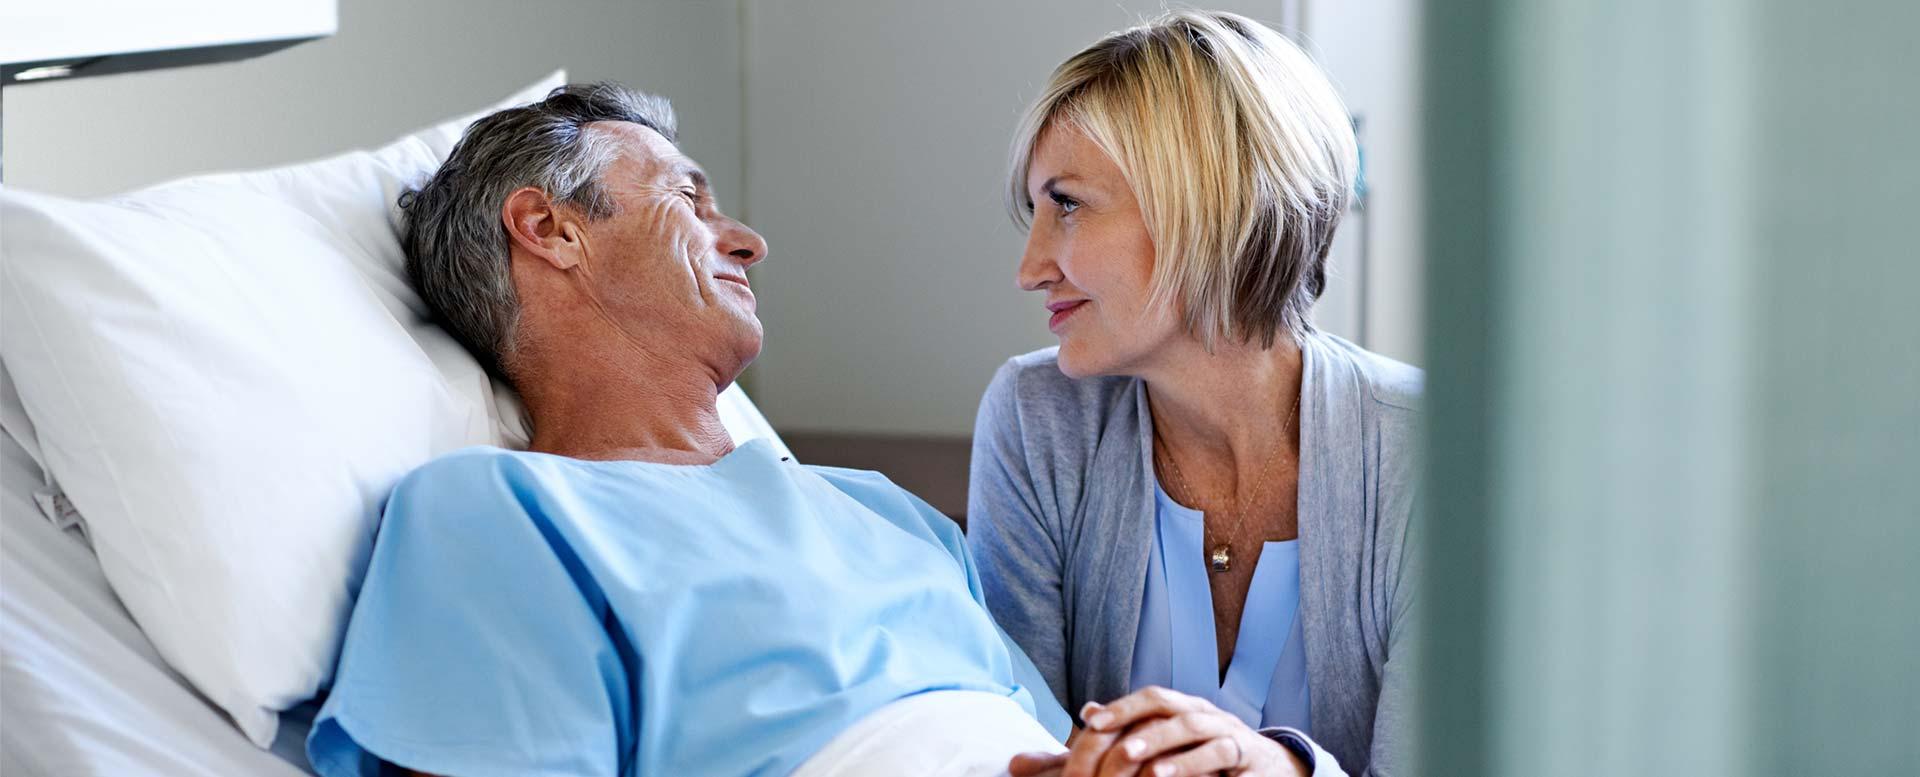 Krankenhauszusatzversicherung sinnvoll?